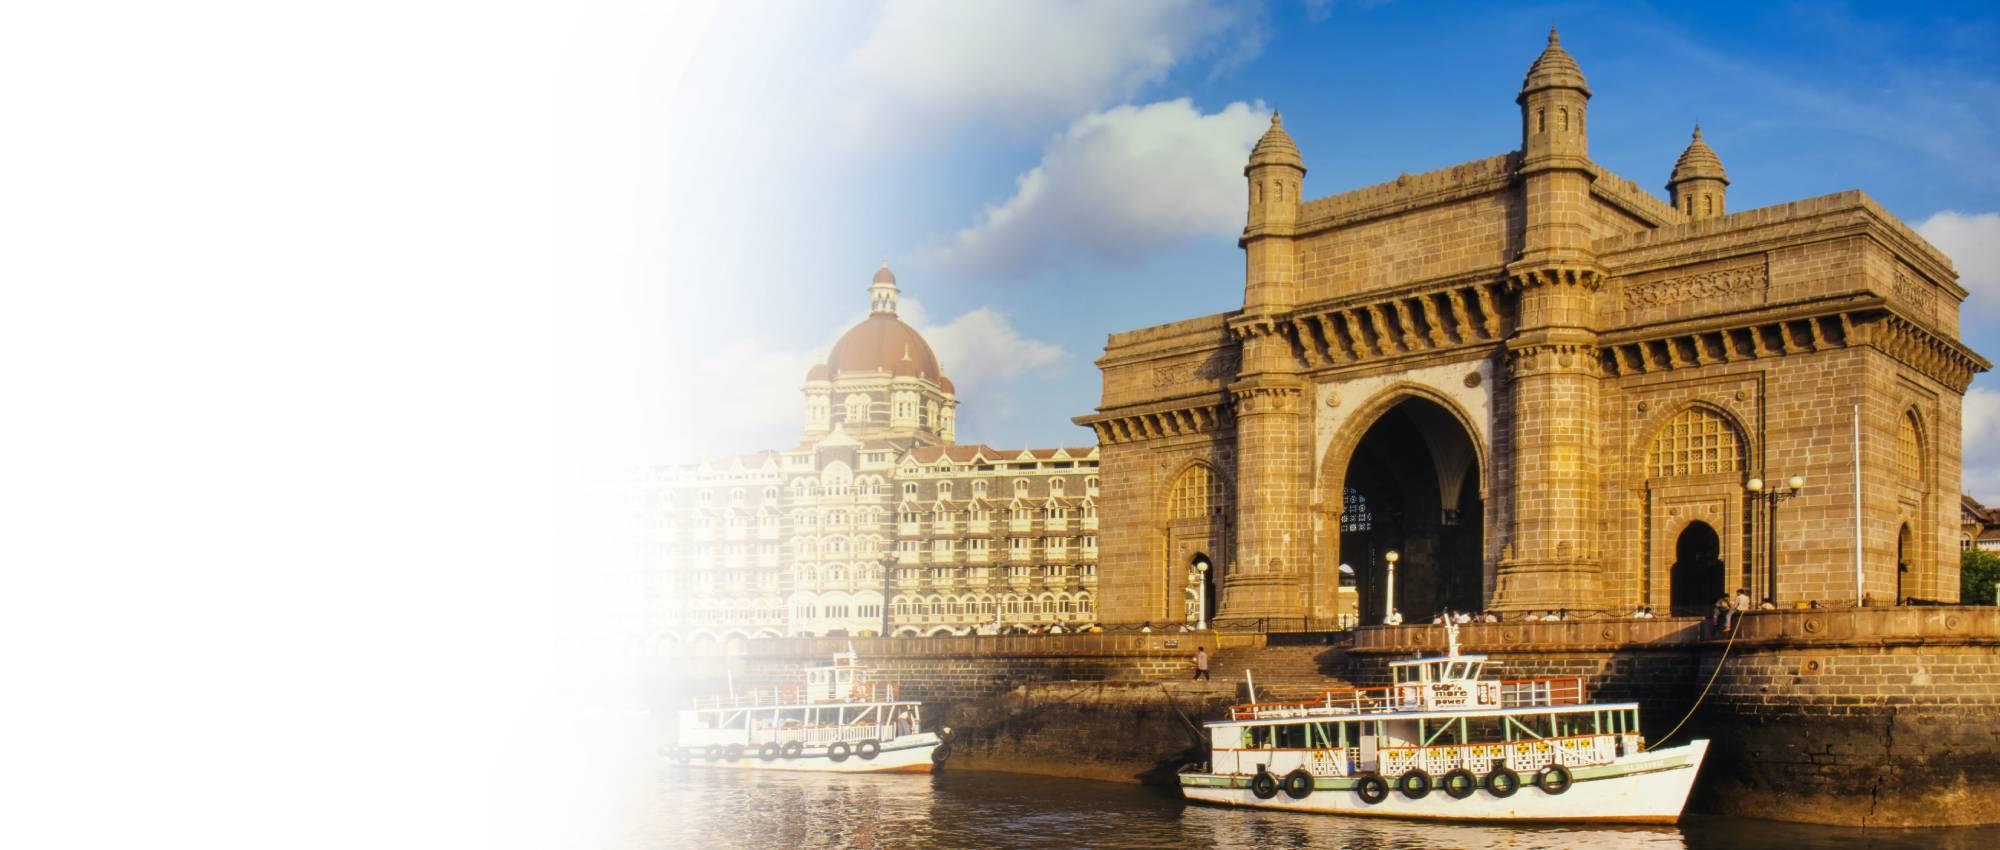 perrigo gateway of india